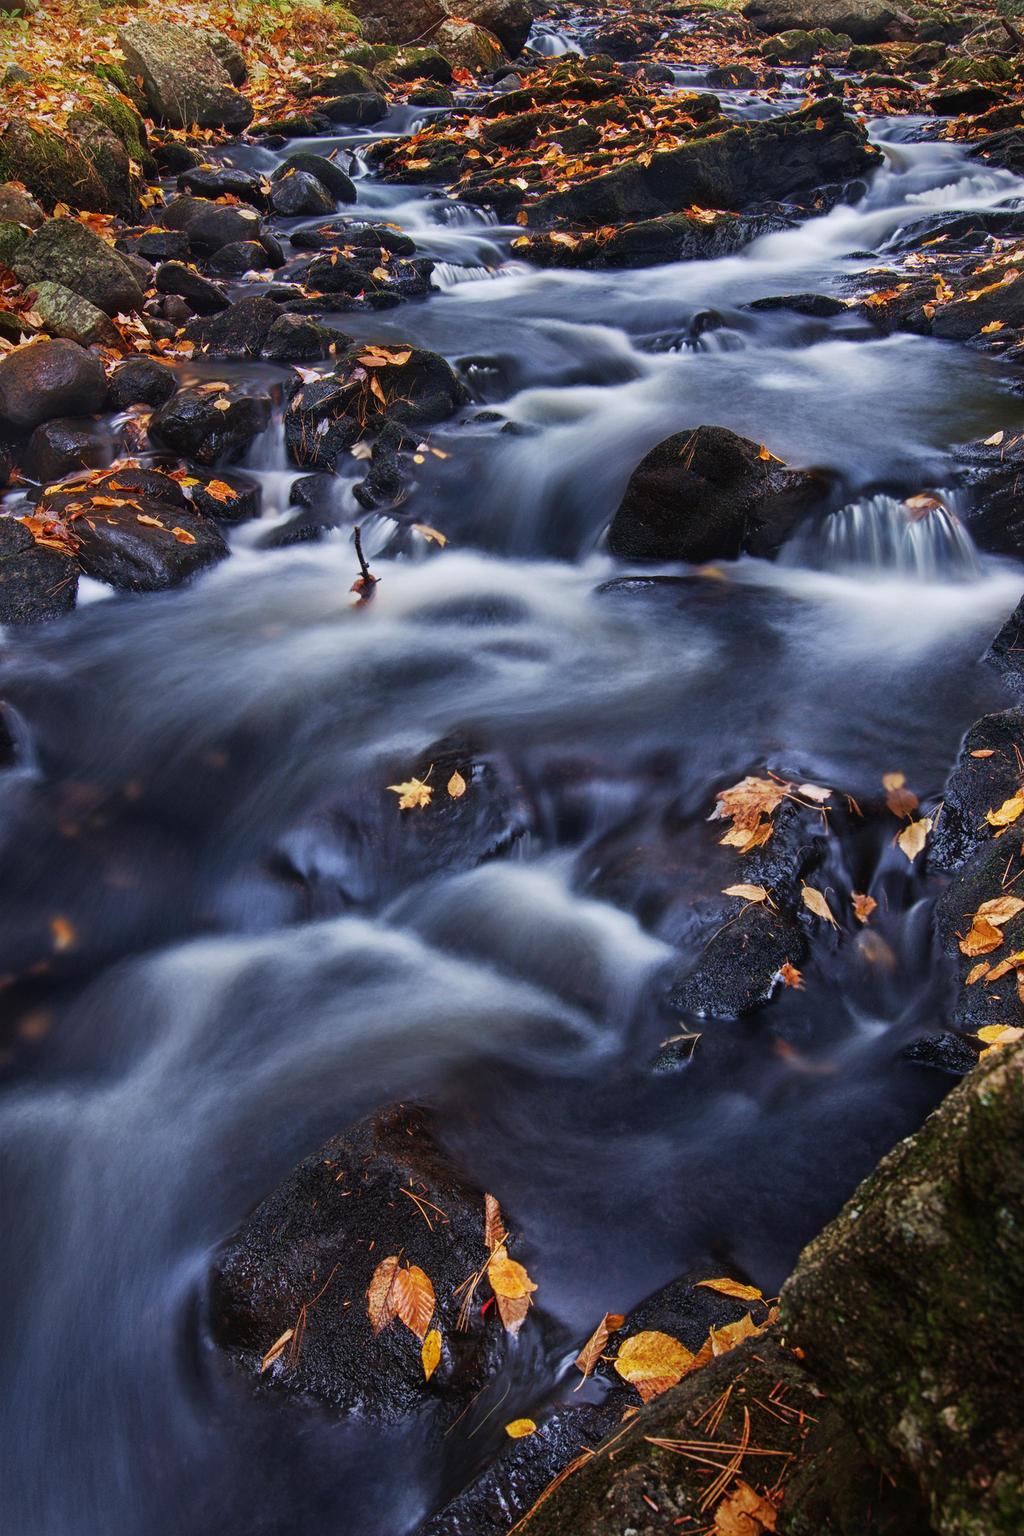 Purgatory Stream by Kintarotpc